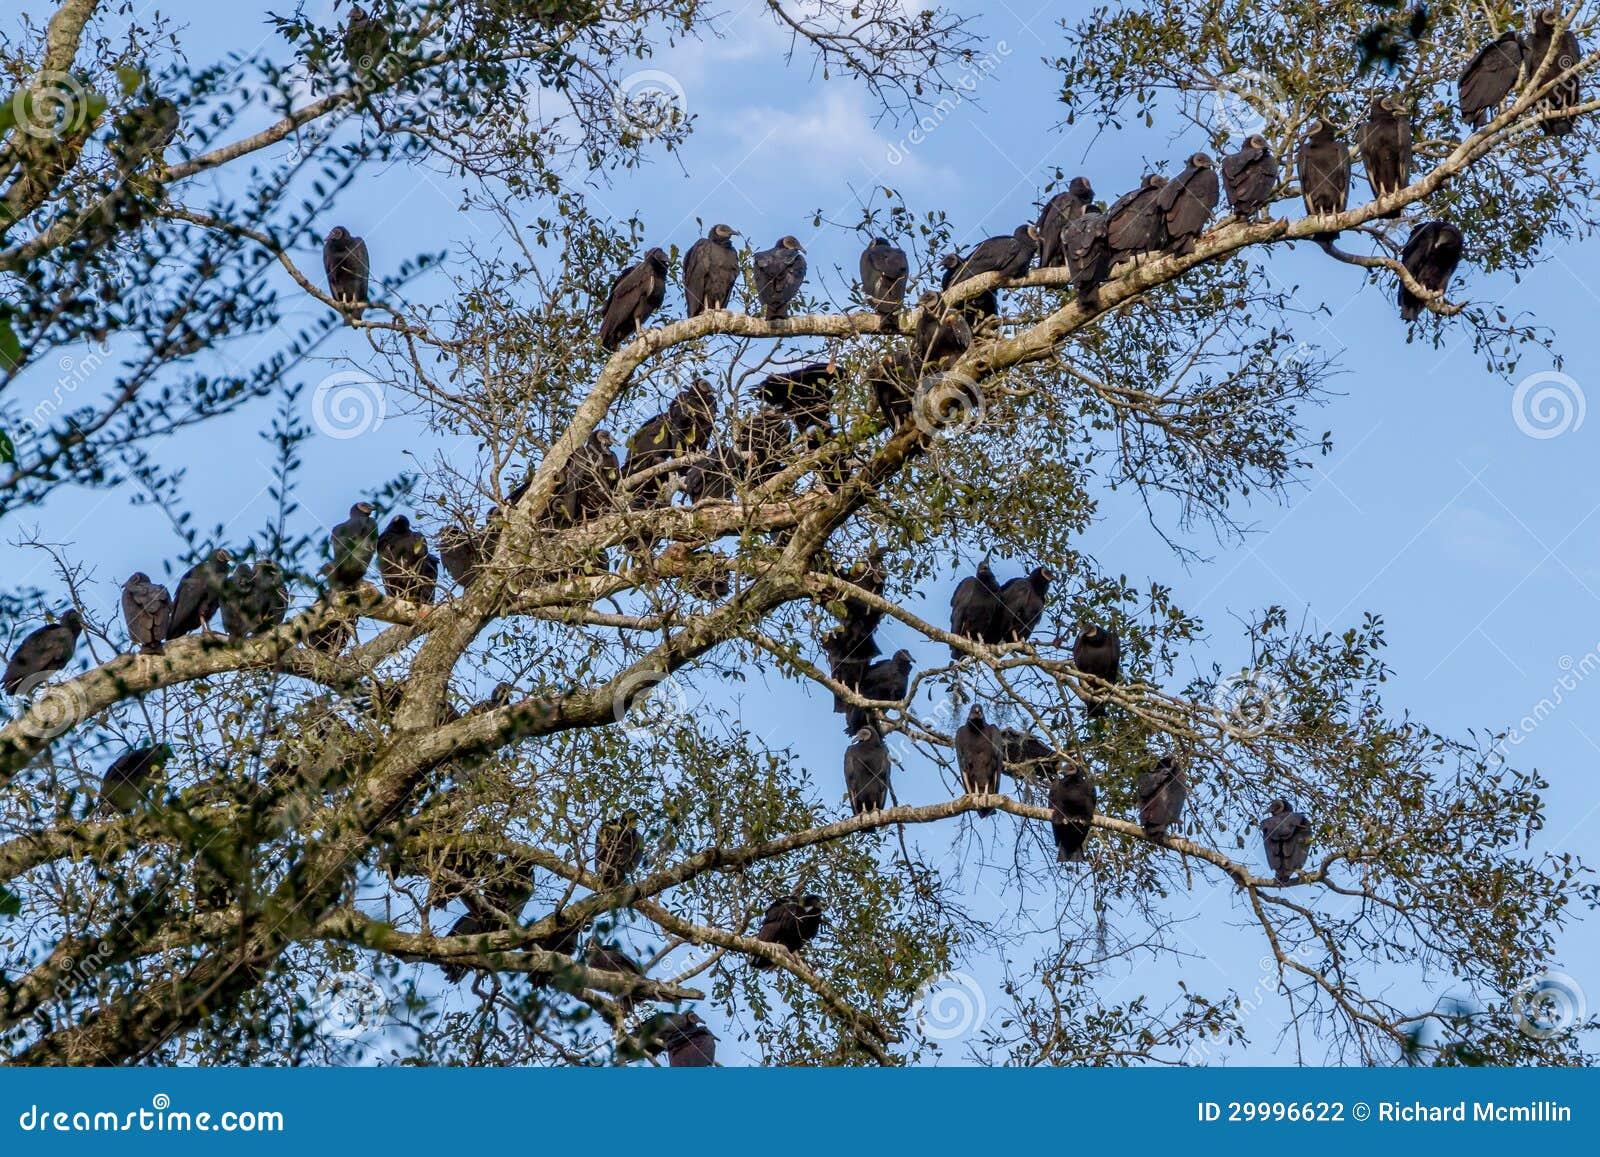 Habitat on web habitat technology group - Large Number Of Buzzards Social Birds Of Opportunity